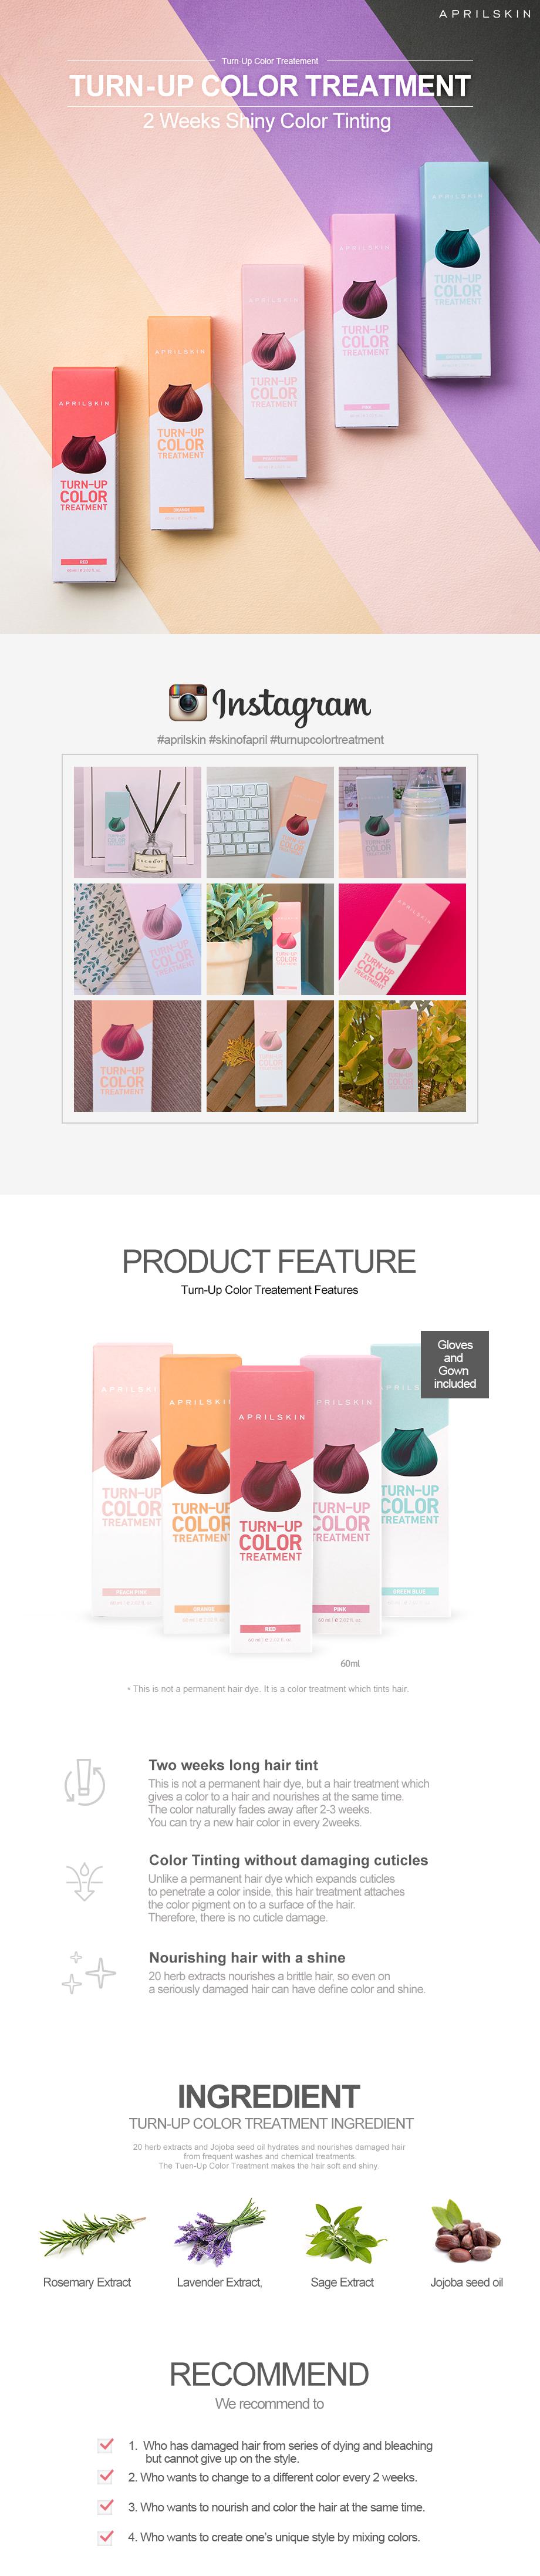 april skin turn up color treatment orange 60ml yamibuy com